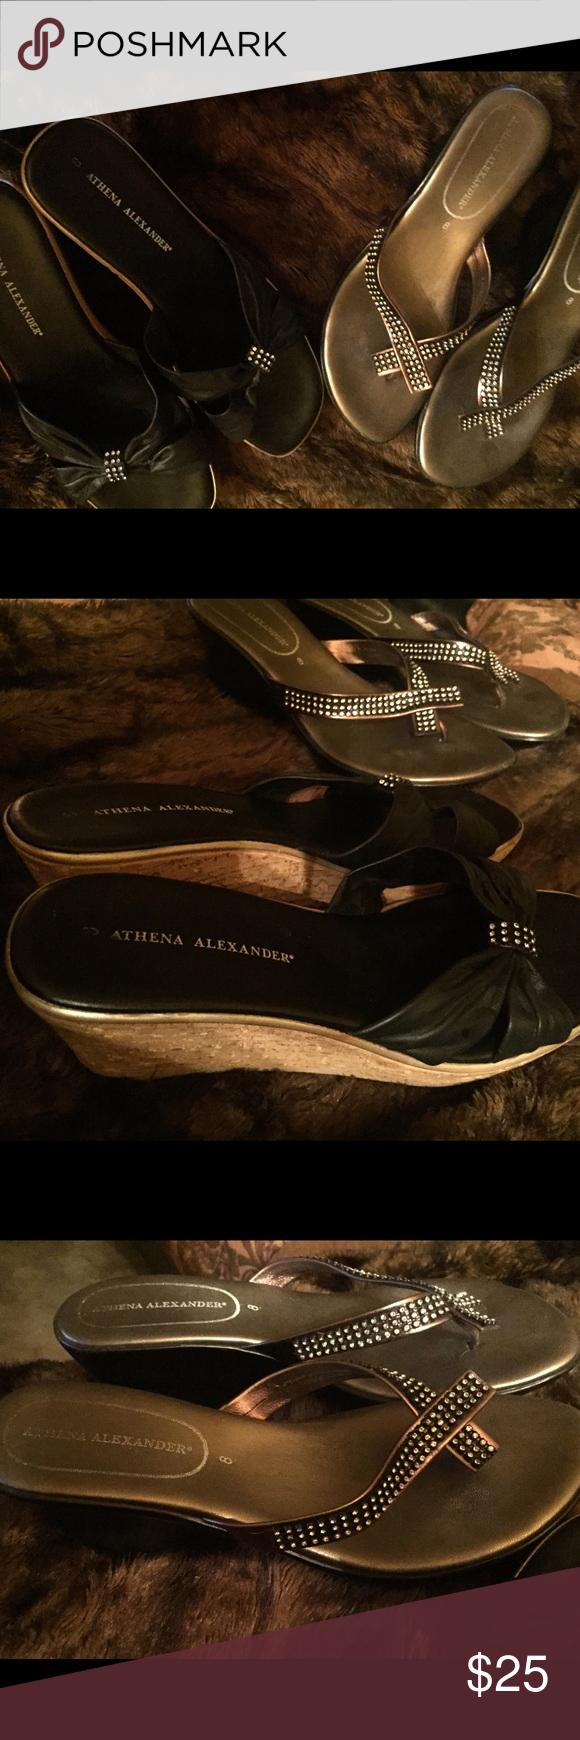 2 Pair Athena Alexander Shoes Sandles Black Silver Excellent Condition Athena Alexander Shoes Sandals